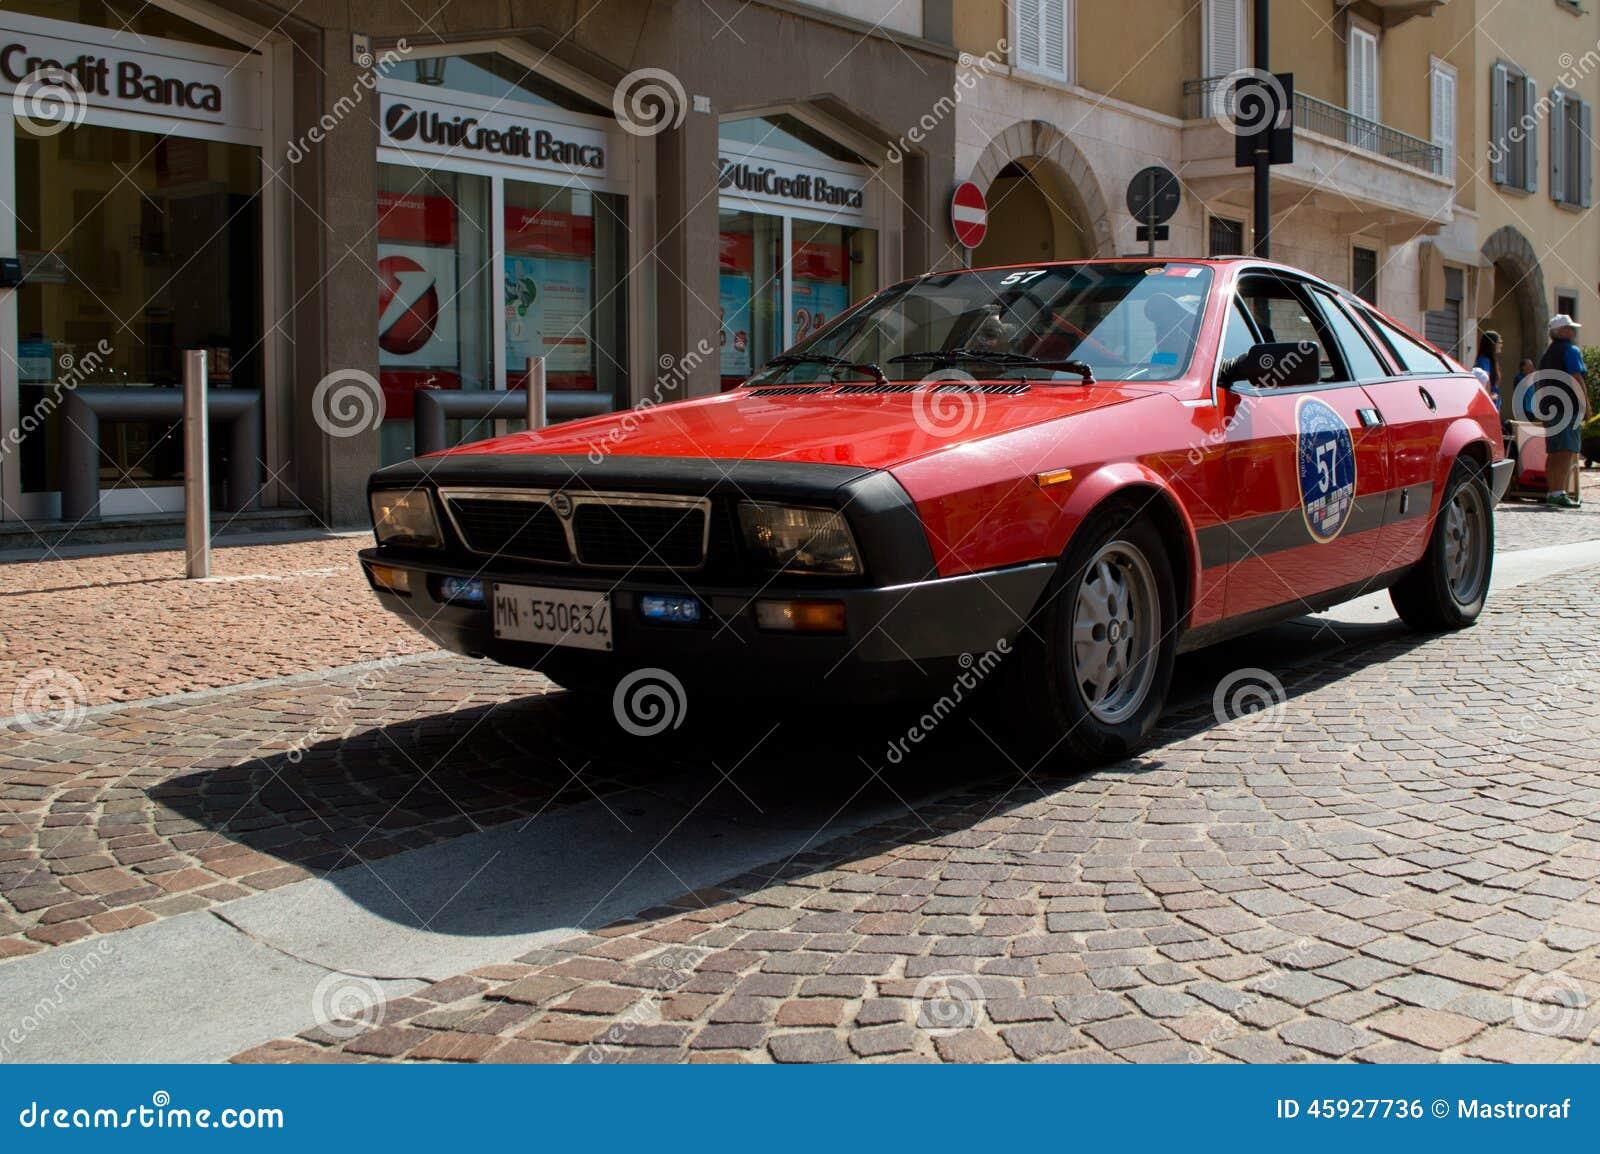 Lancia Beta Montecarlo At Circuito Di Zingonia 2014